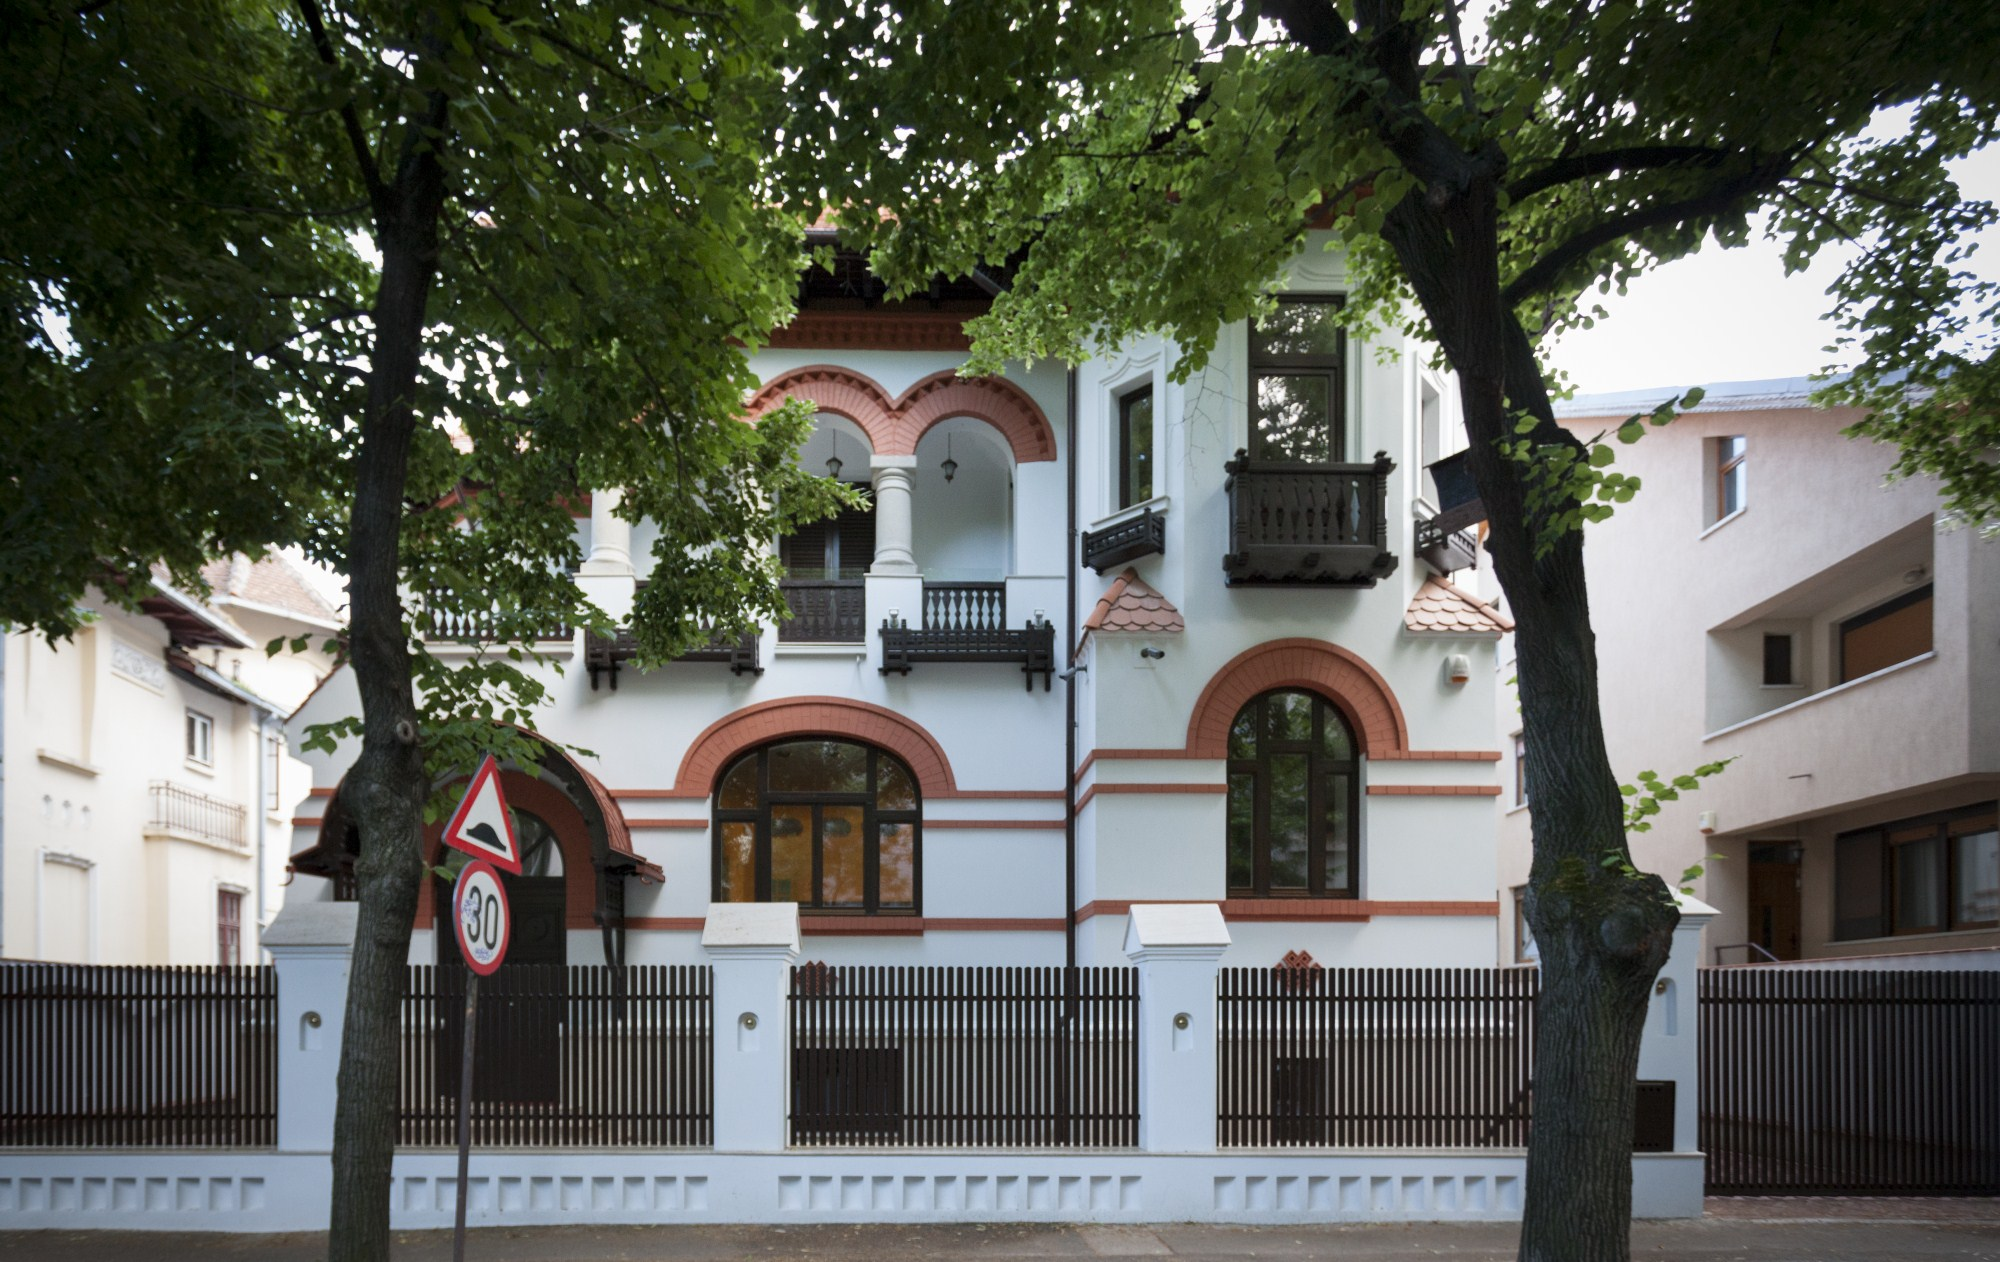 https://nbc-arhitect.ro/wp-content/uploads/2020/10/NBC-Arhitect-_-restorations-_-Washington-House-_-Bucharest-Romania_82.jpg